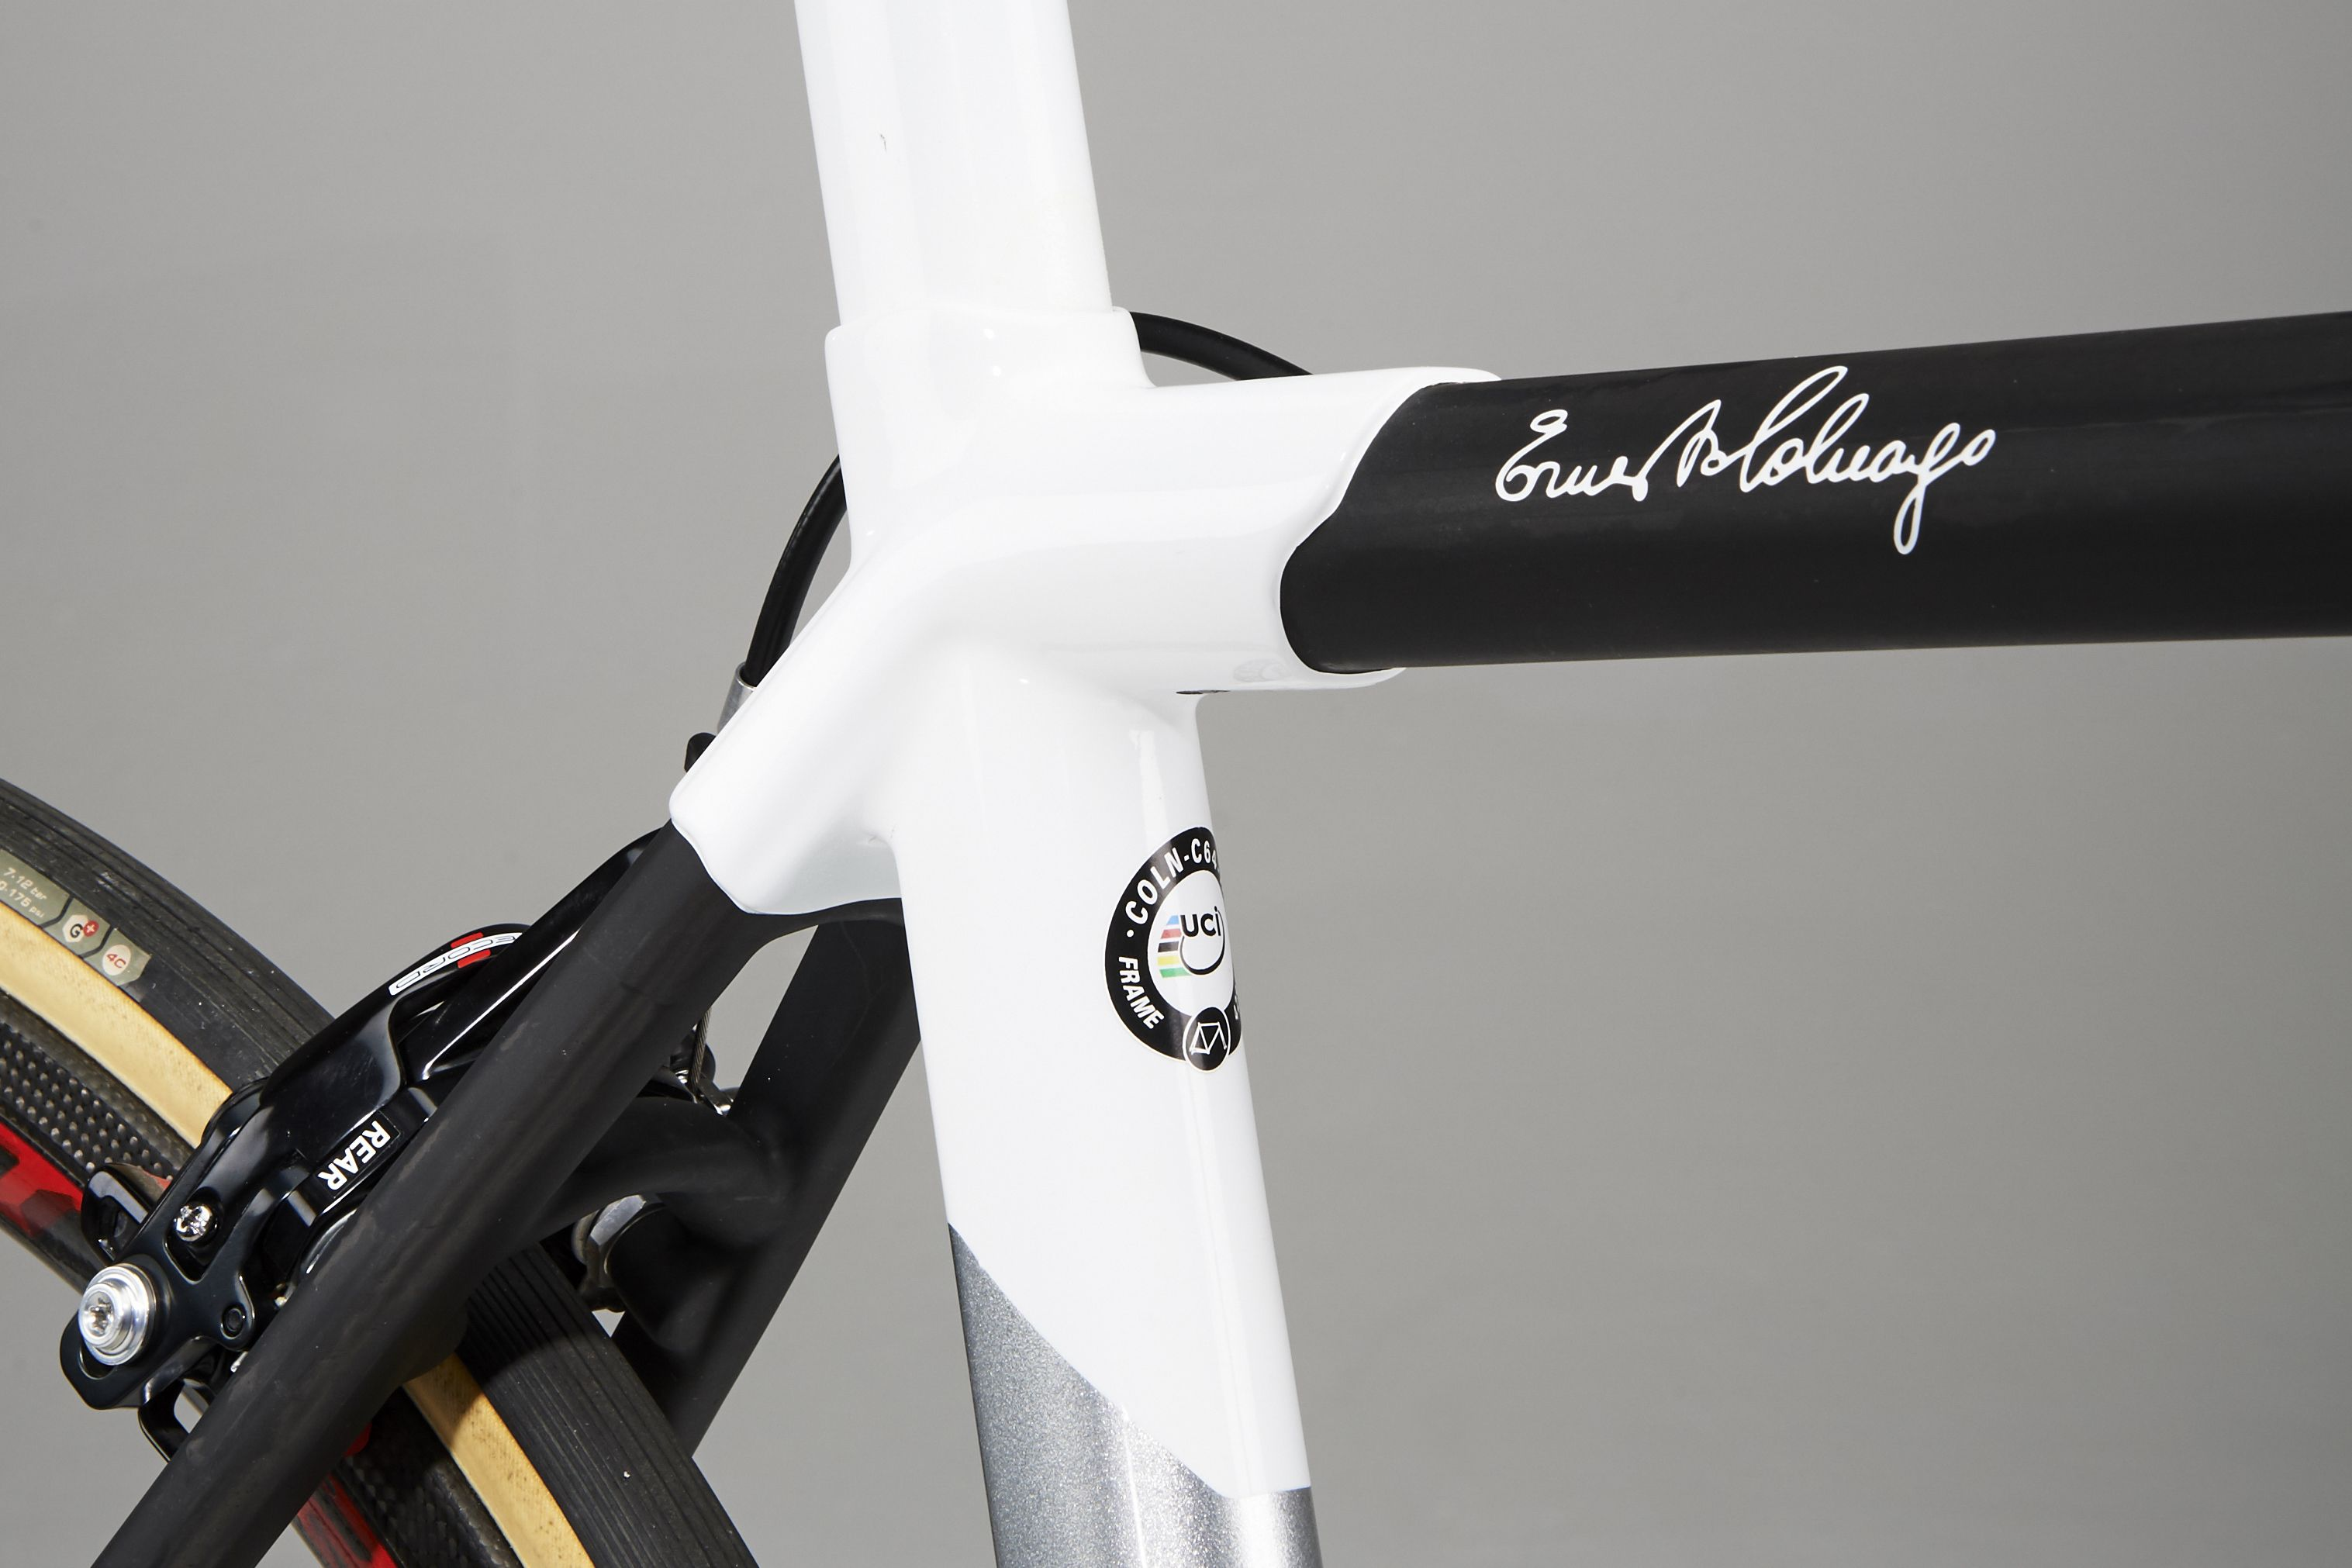 1fd9504f9db Colnago C64 Road Bike Review - Best Aero Race Bikes